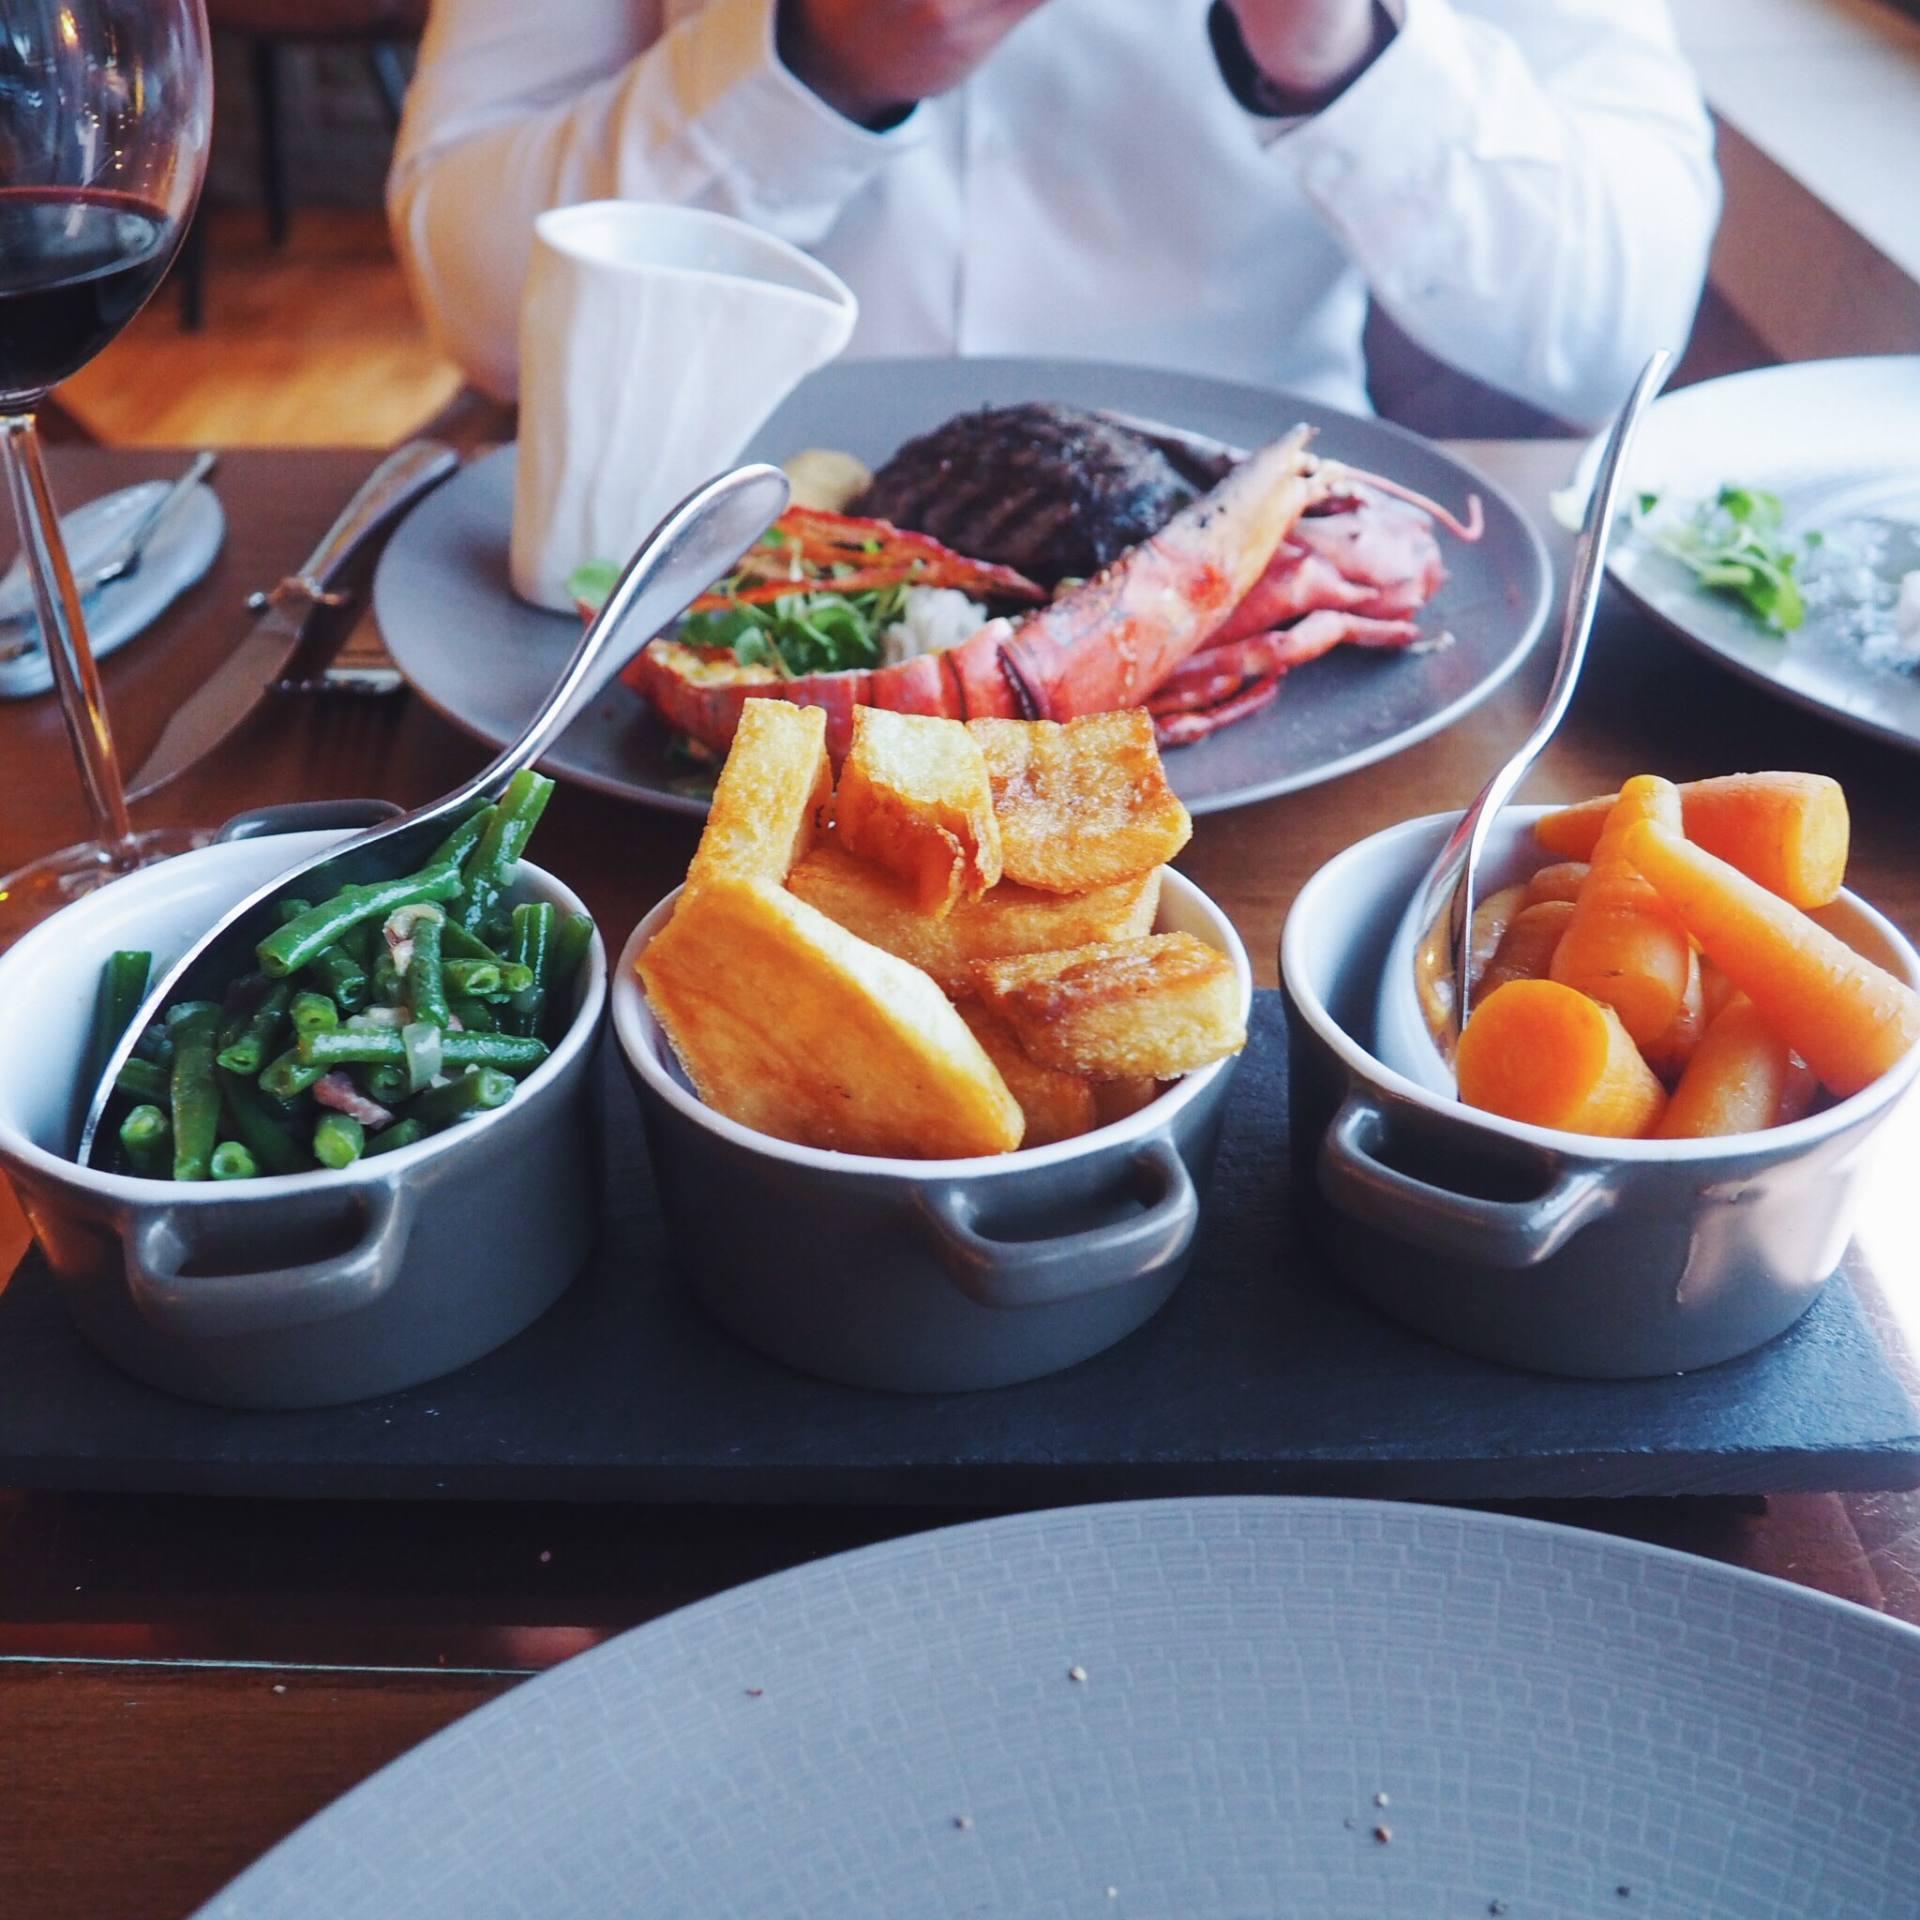 French beans, bacon and shallots, potatoes and chantenay carrots